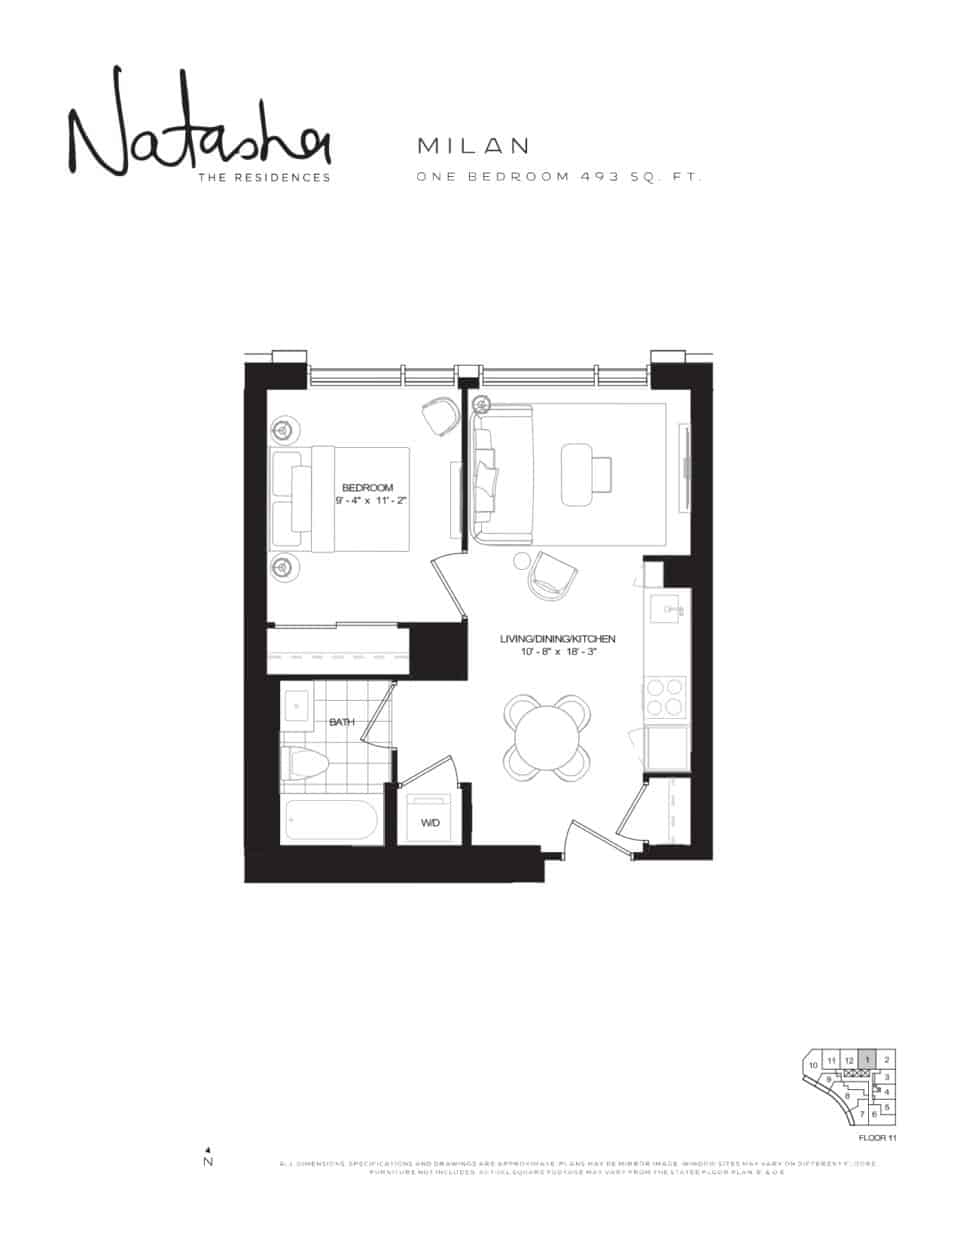 2021 09 02 11 02 38 natashatheresidences lanterradevelopments floorplans milan